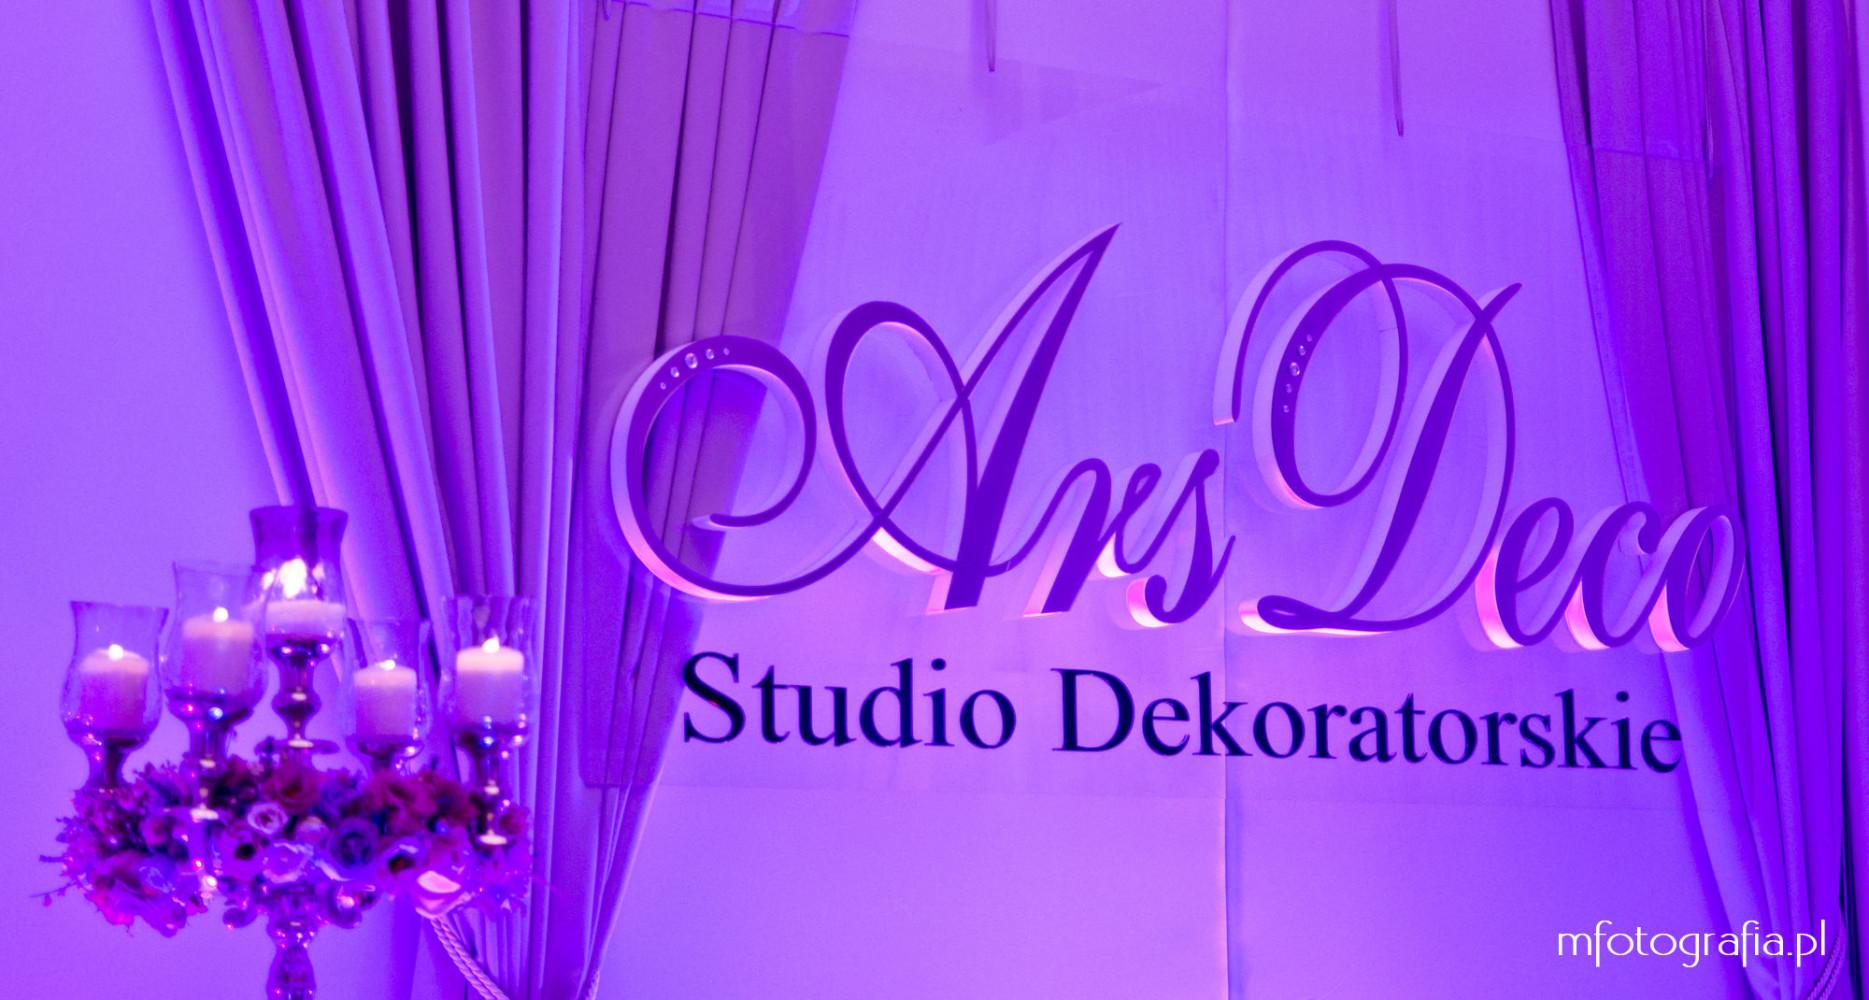 logo Ars Deco - Studio Dekoratorskie